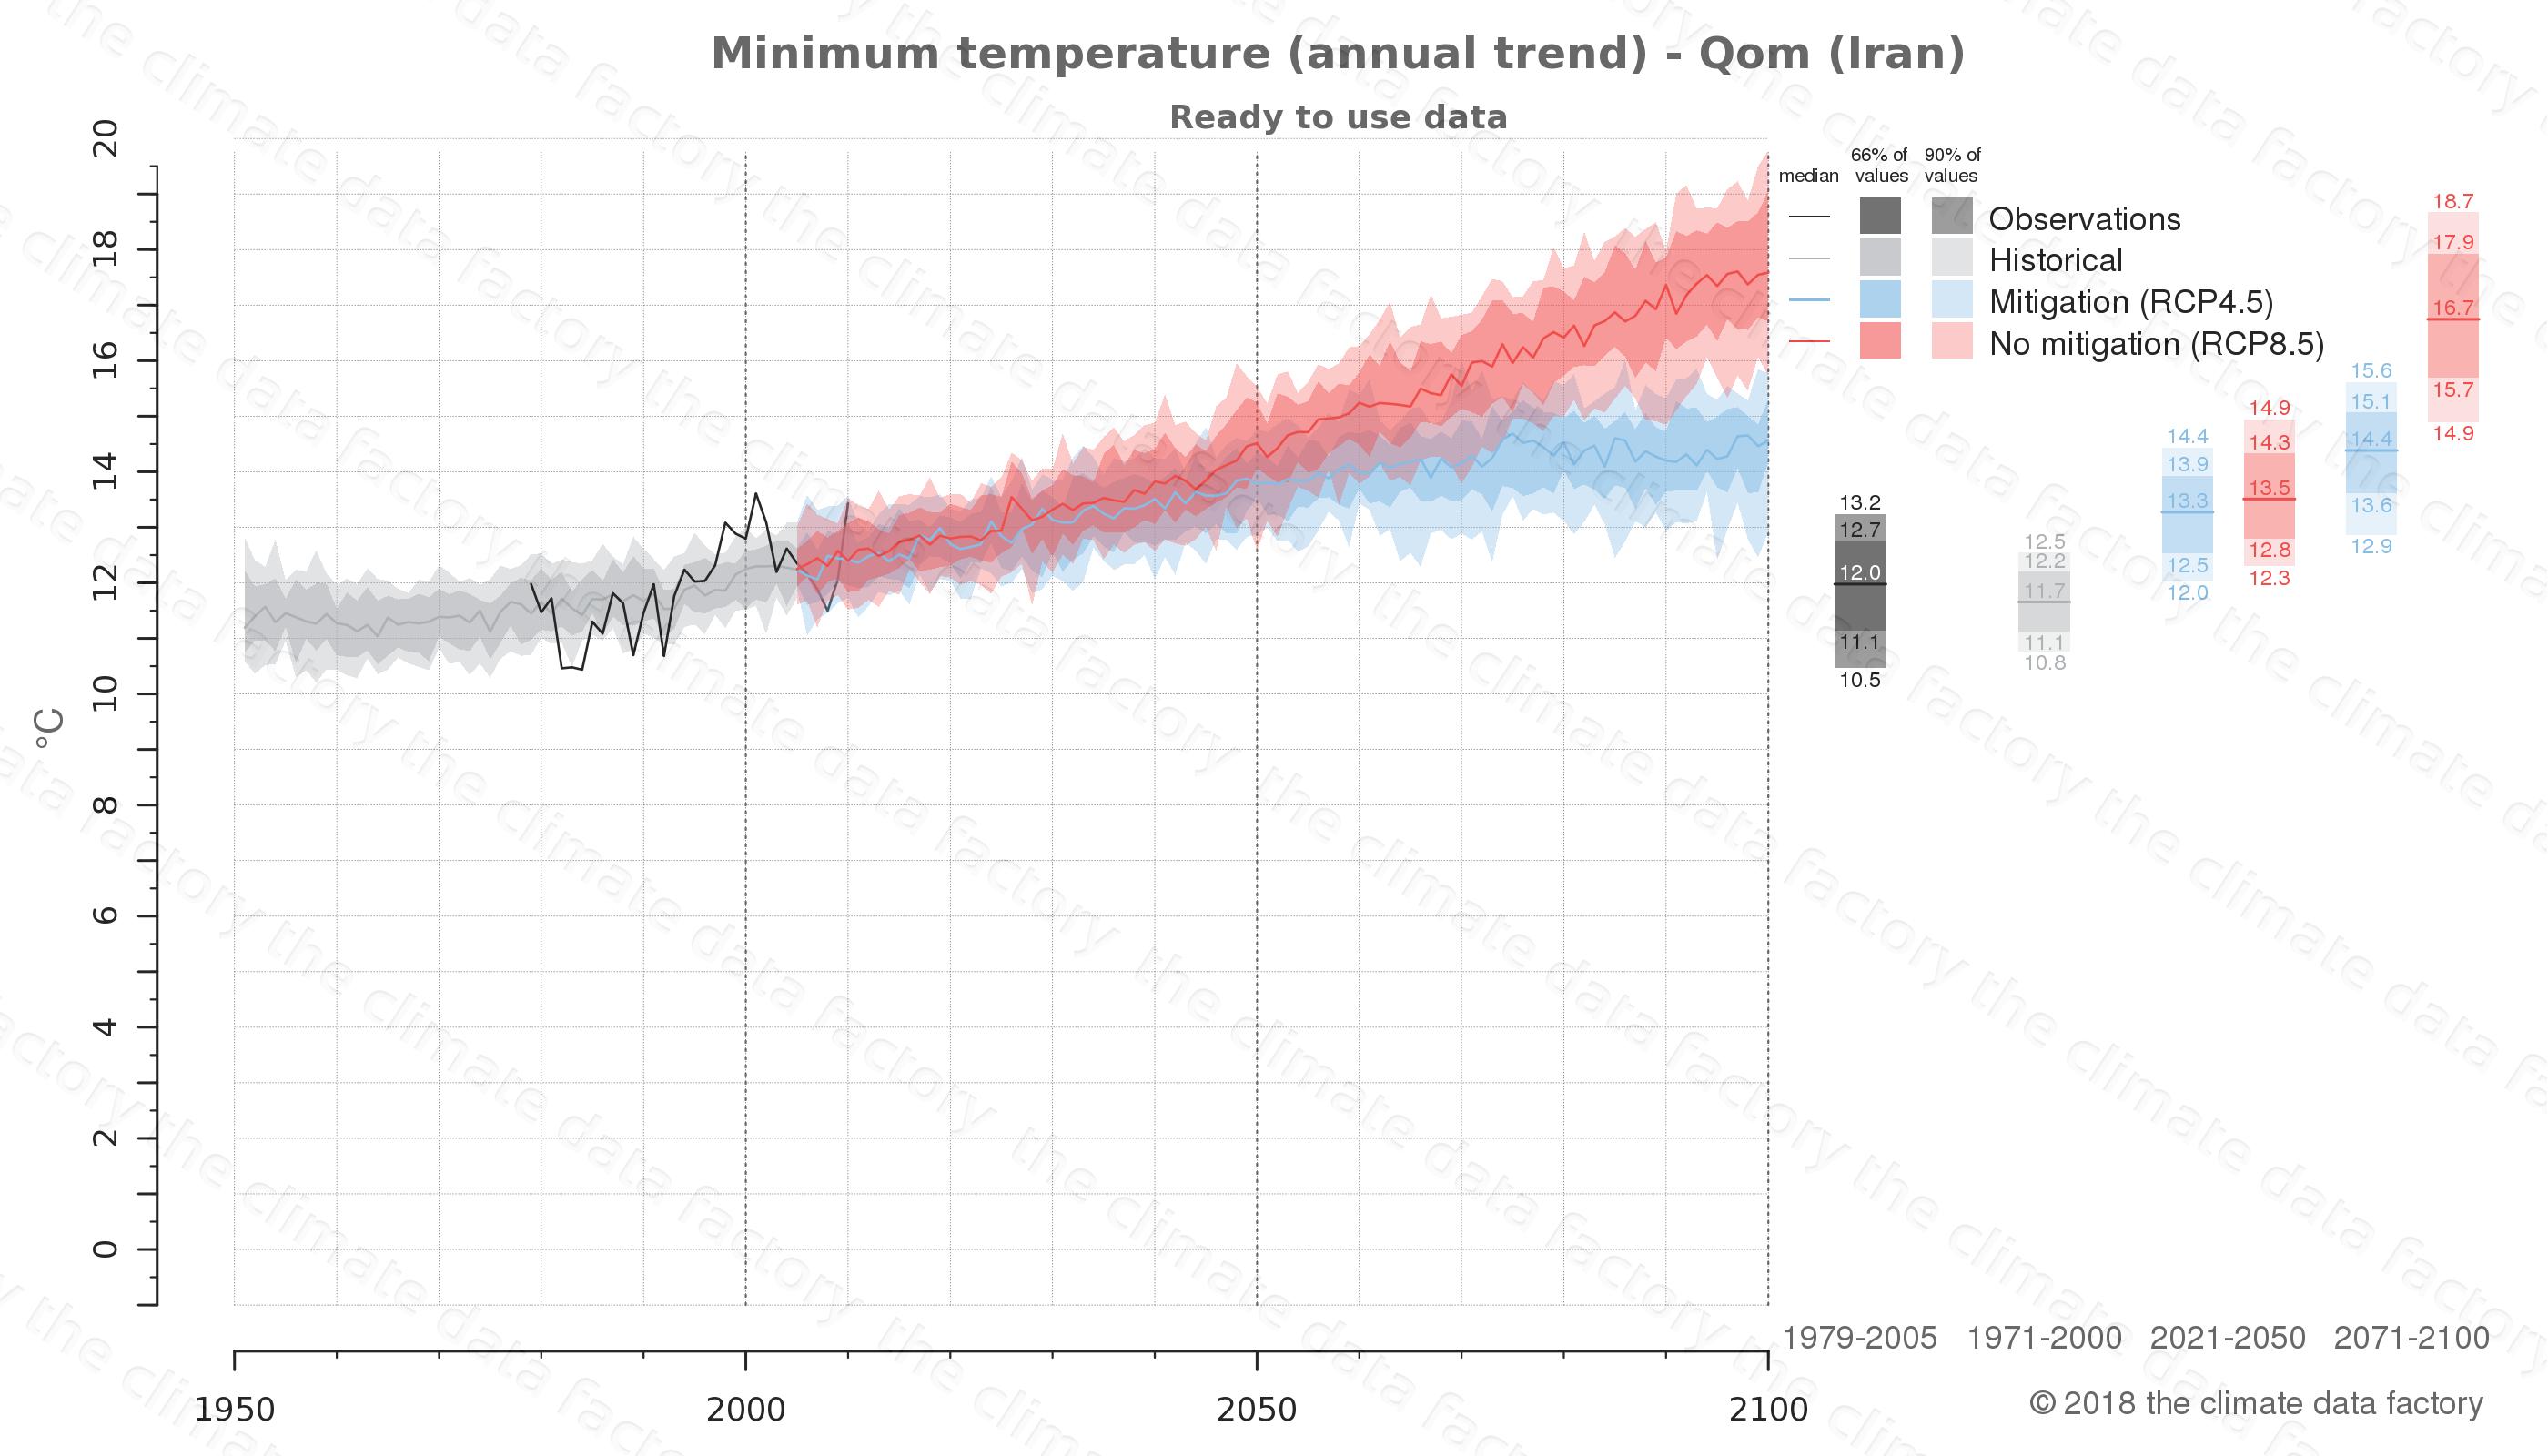 climate change data policy adaptation climate graph city data minimum-temperature qom iran